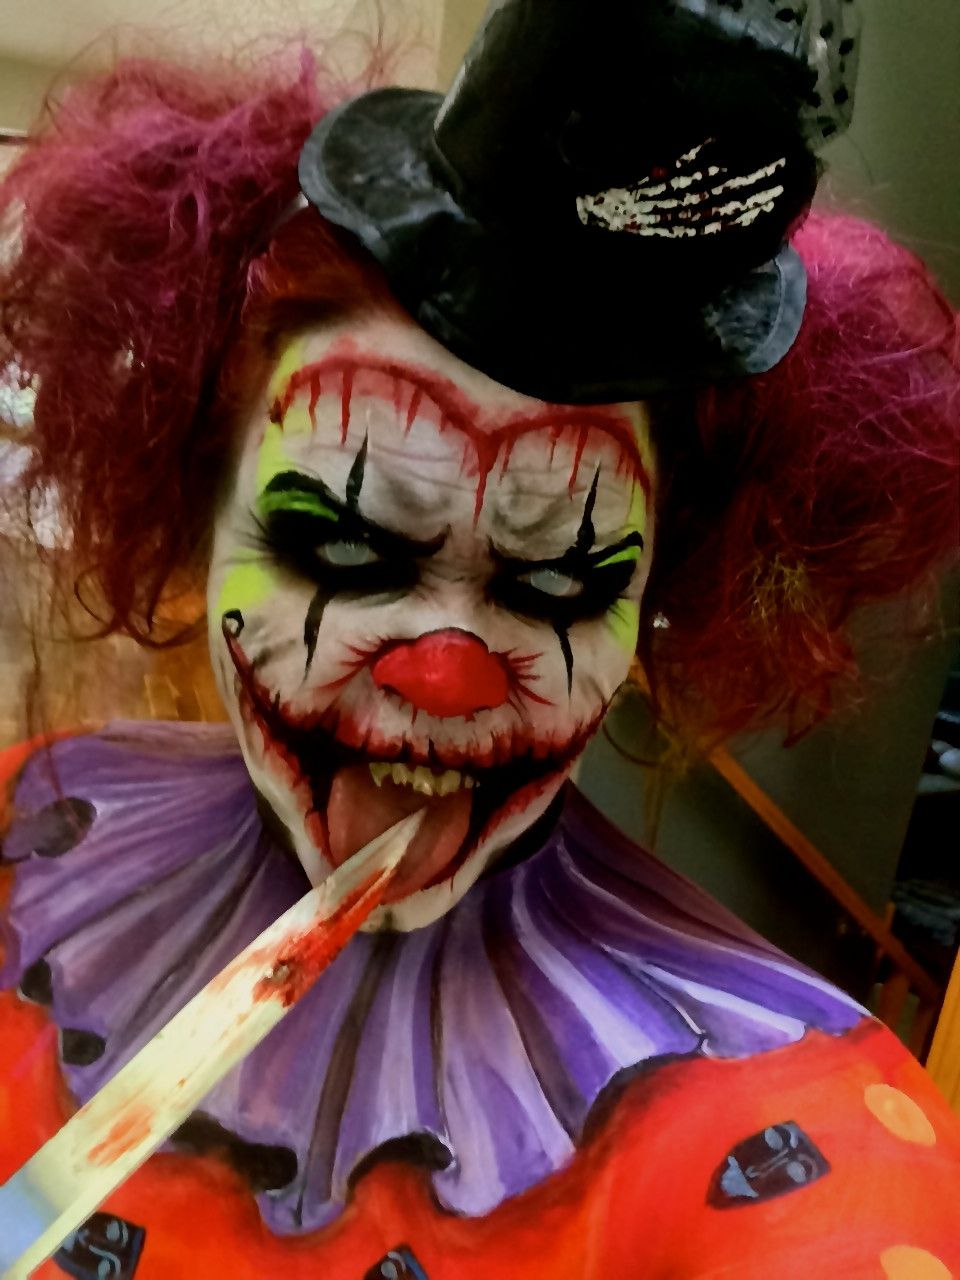 psycho killer clown knives entertainment and halloween makeup